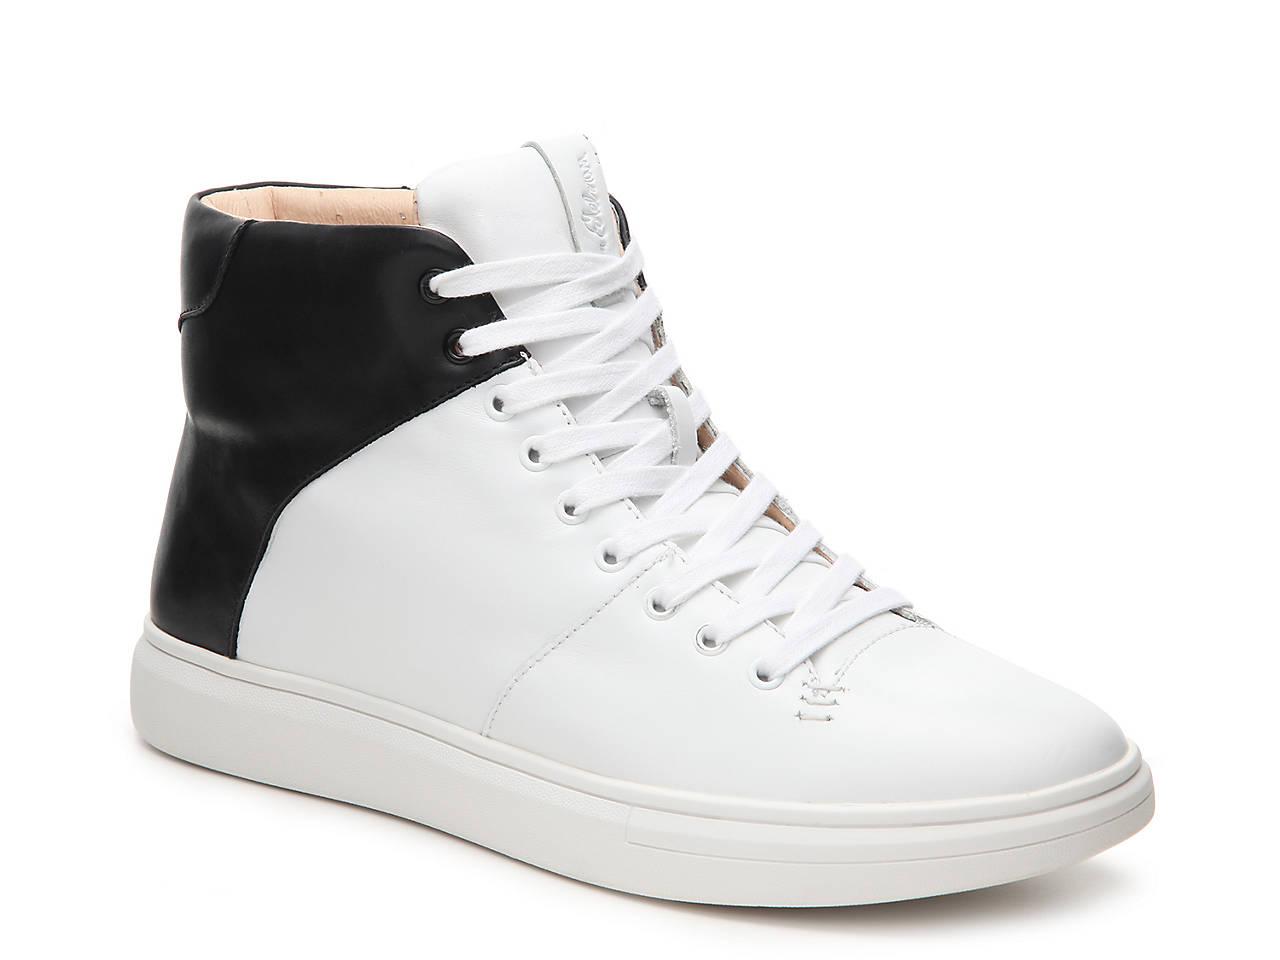 52b7b1f58e1f Sam Edelman Jerry High-Top Sneaker Men s Shoes